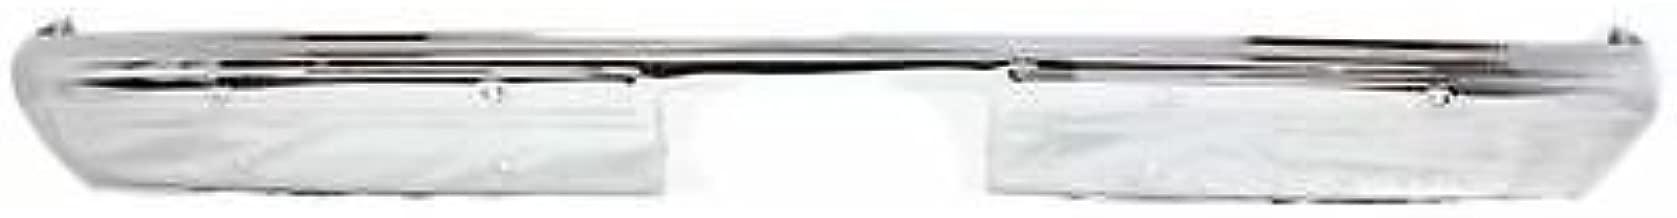 1987 c10 rear bumper